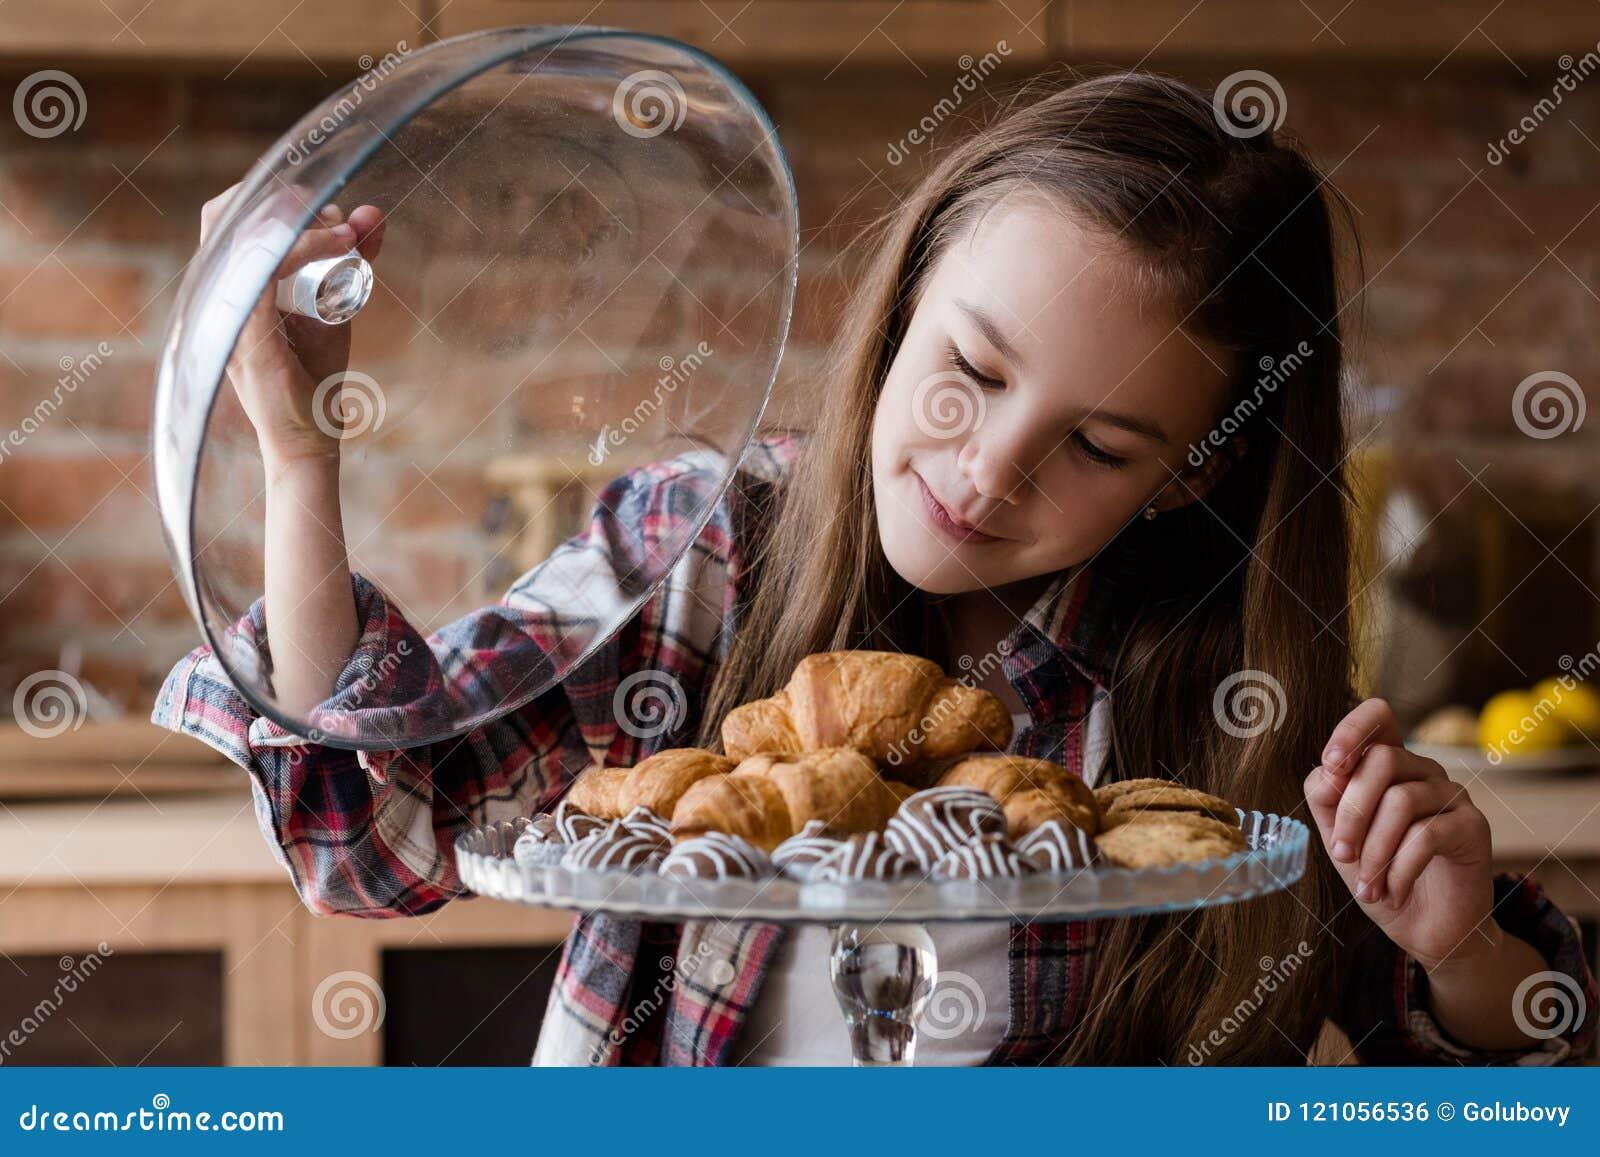 Child unbalanced eating habits sweets overeating